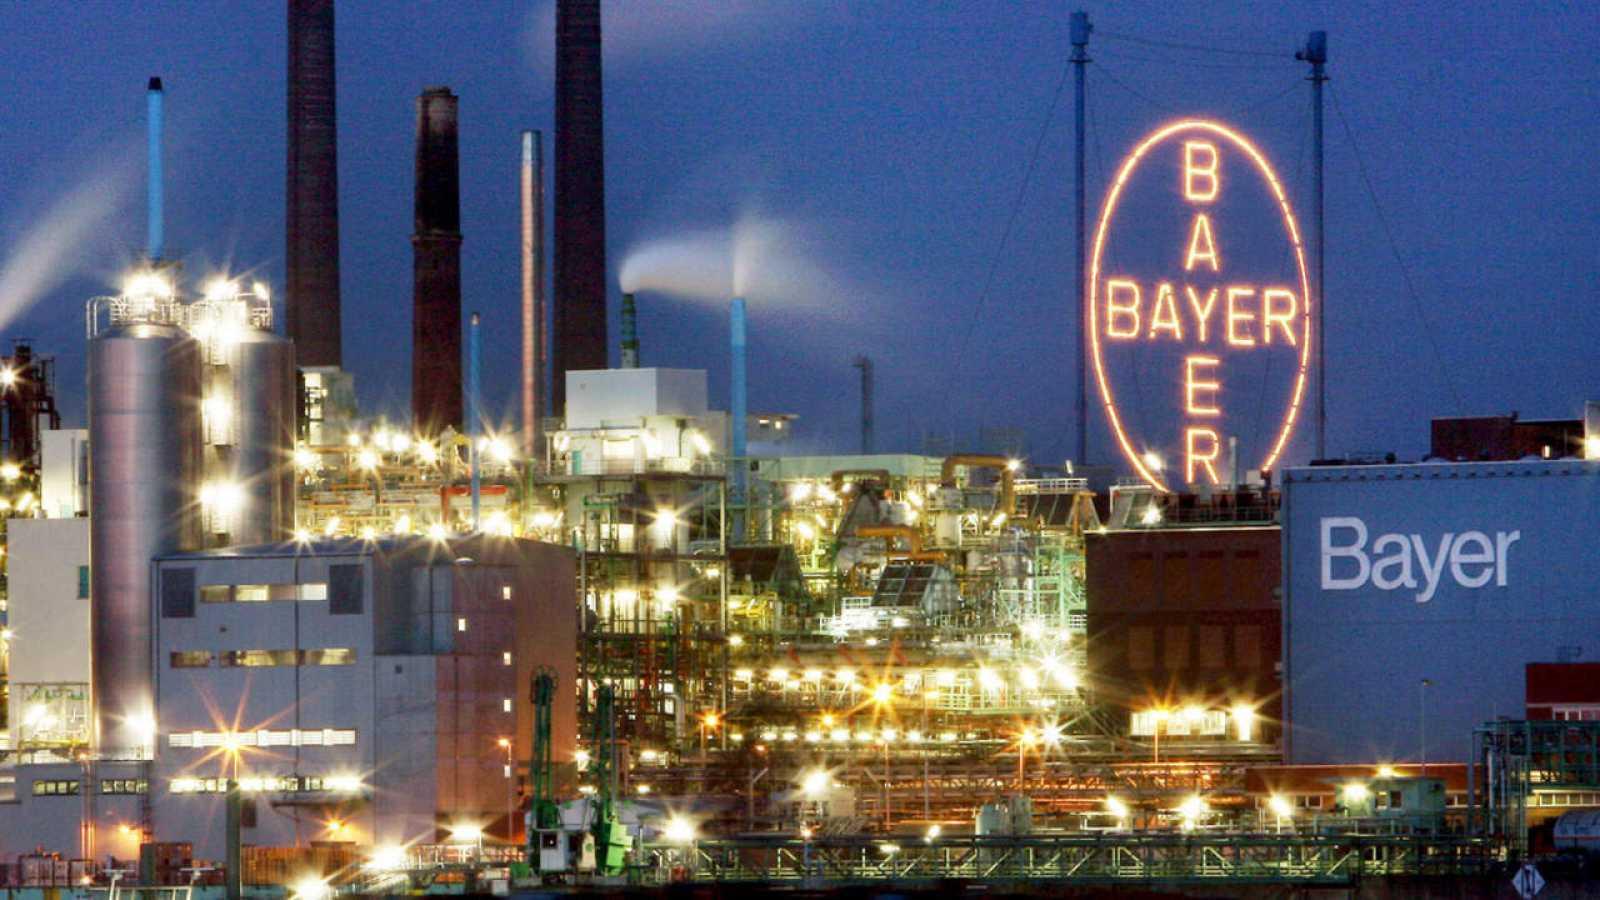 La fábrica de Bayer en Leverkusen